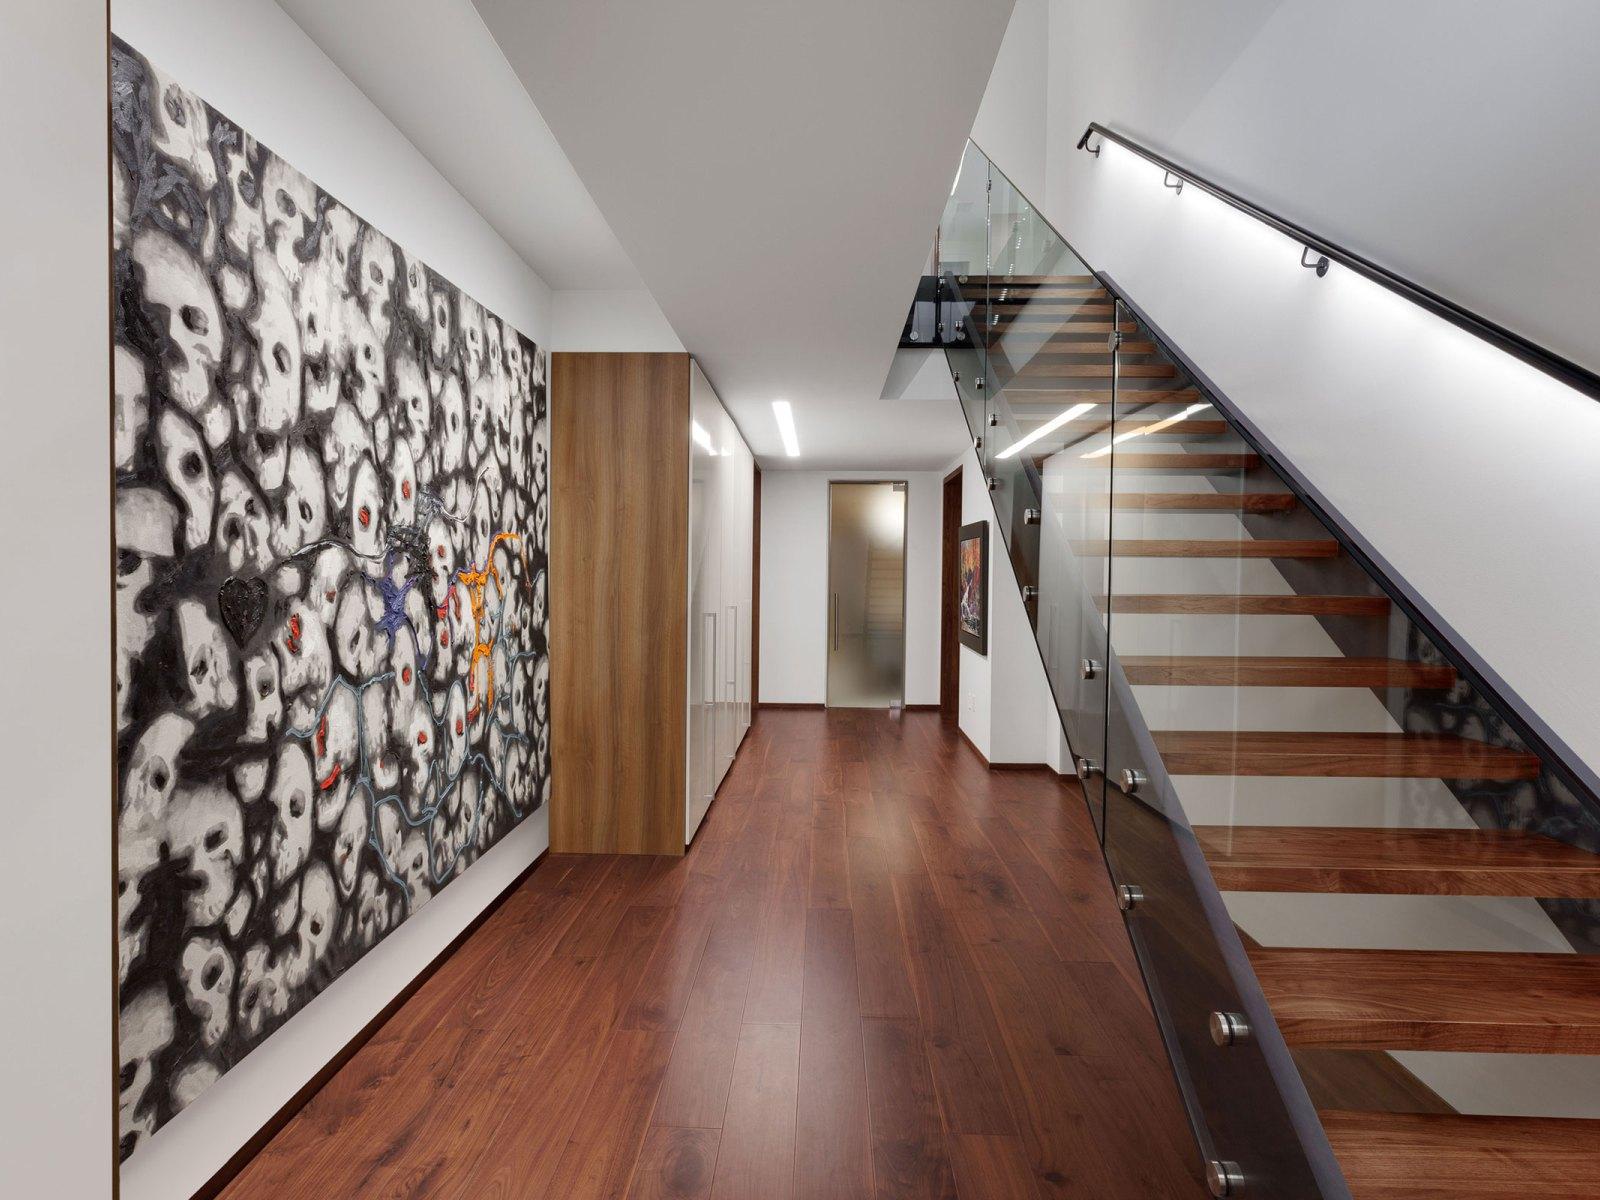 interior-fabulous-design-with-modern-stair-railing-ideas ...